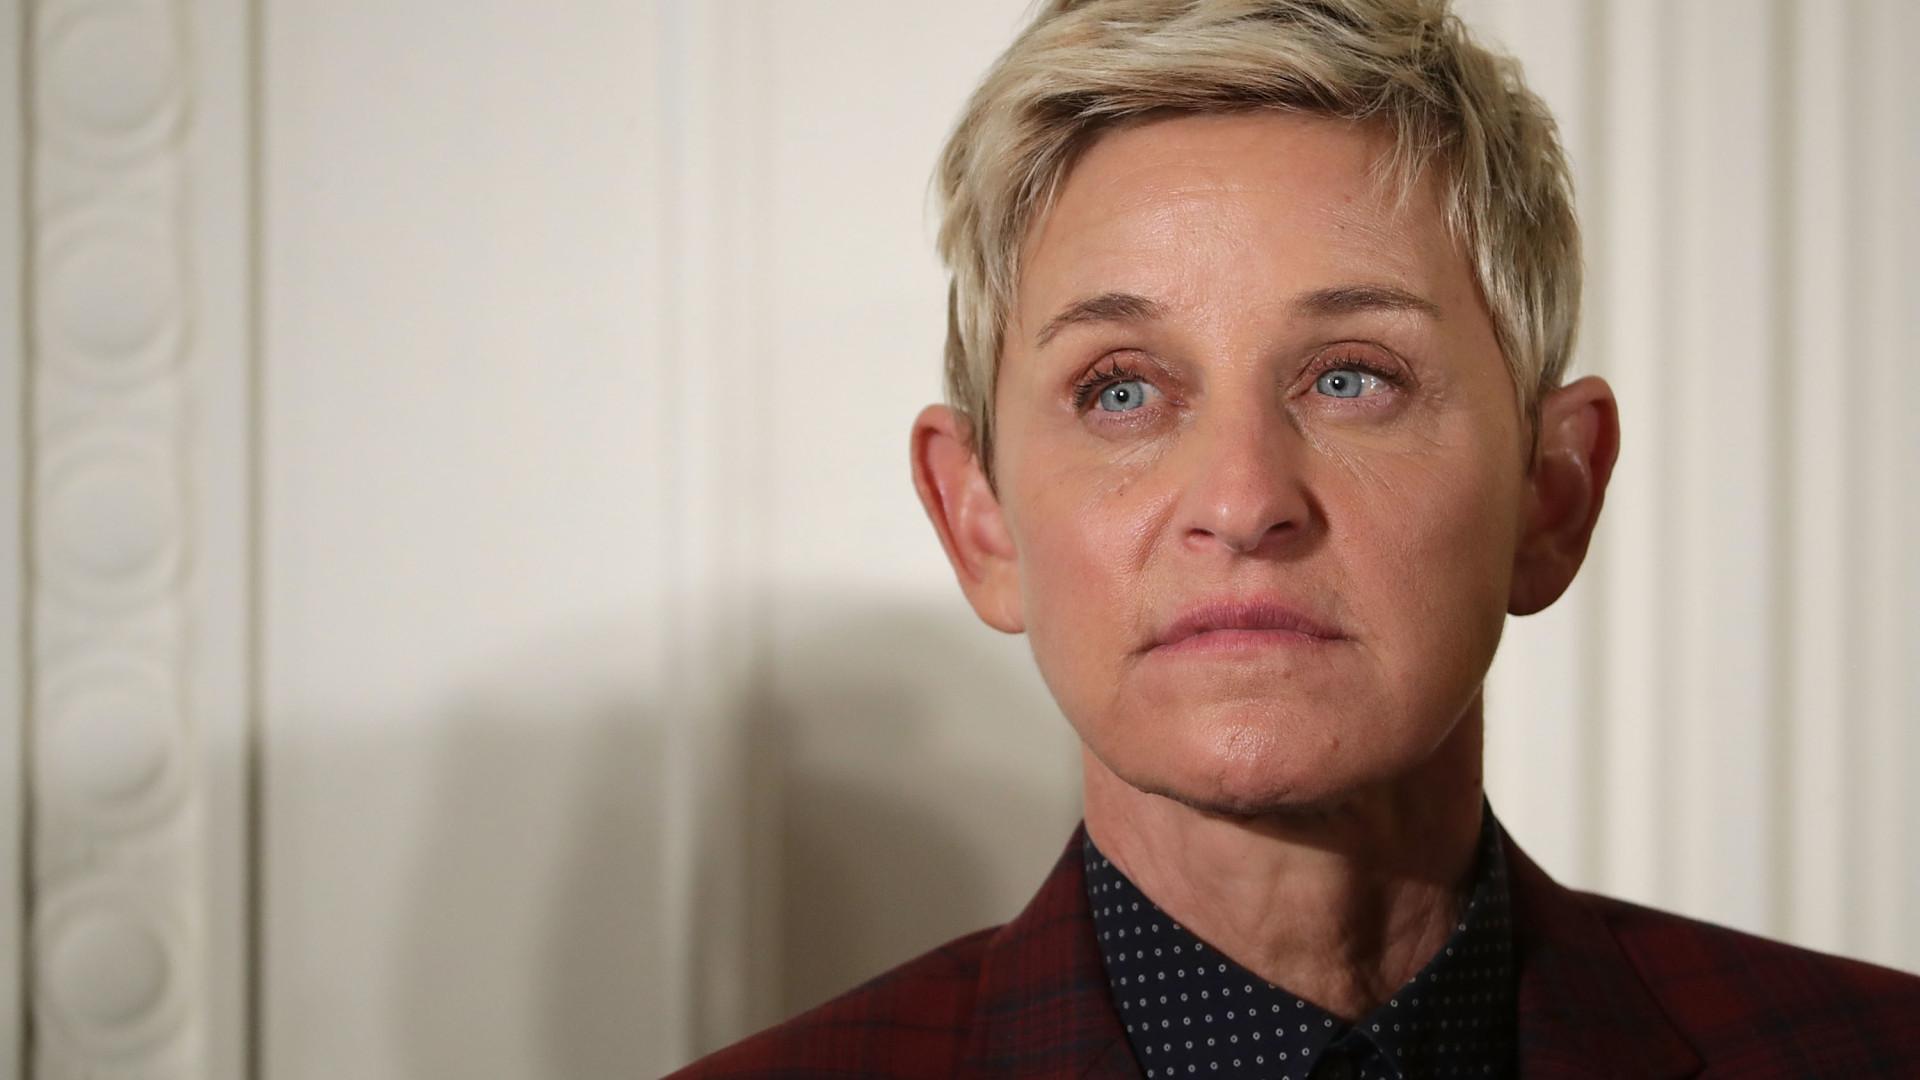 Ellen DeGeneres fala sobre os abusos sexuais que sofreu na infância